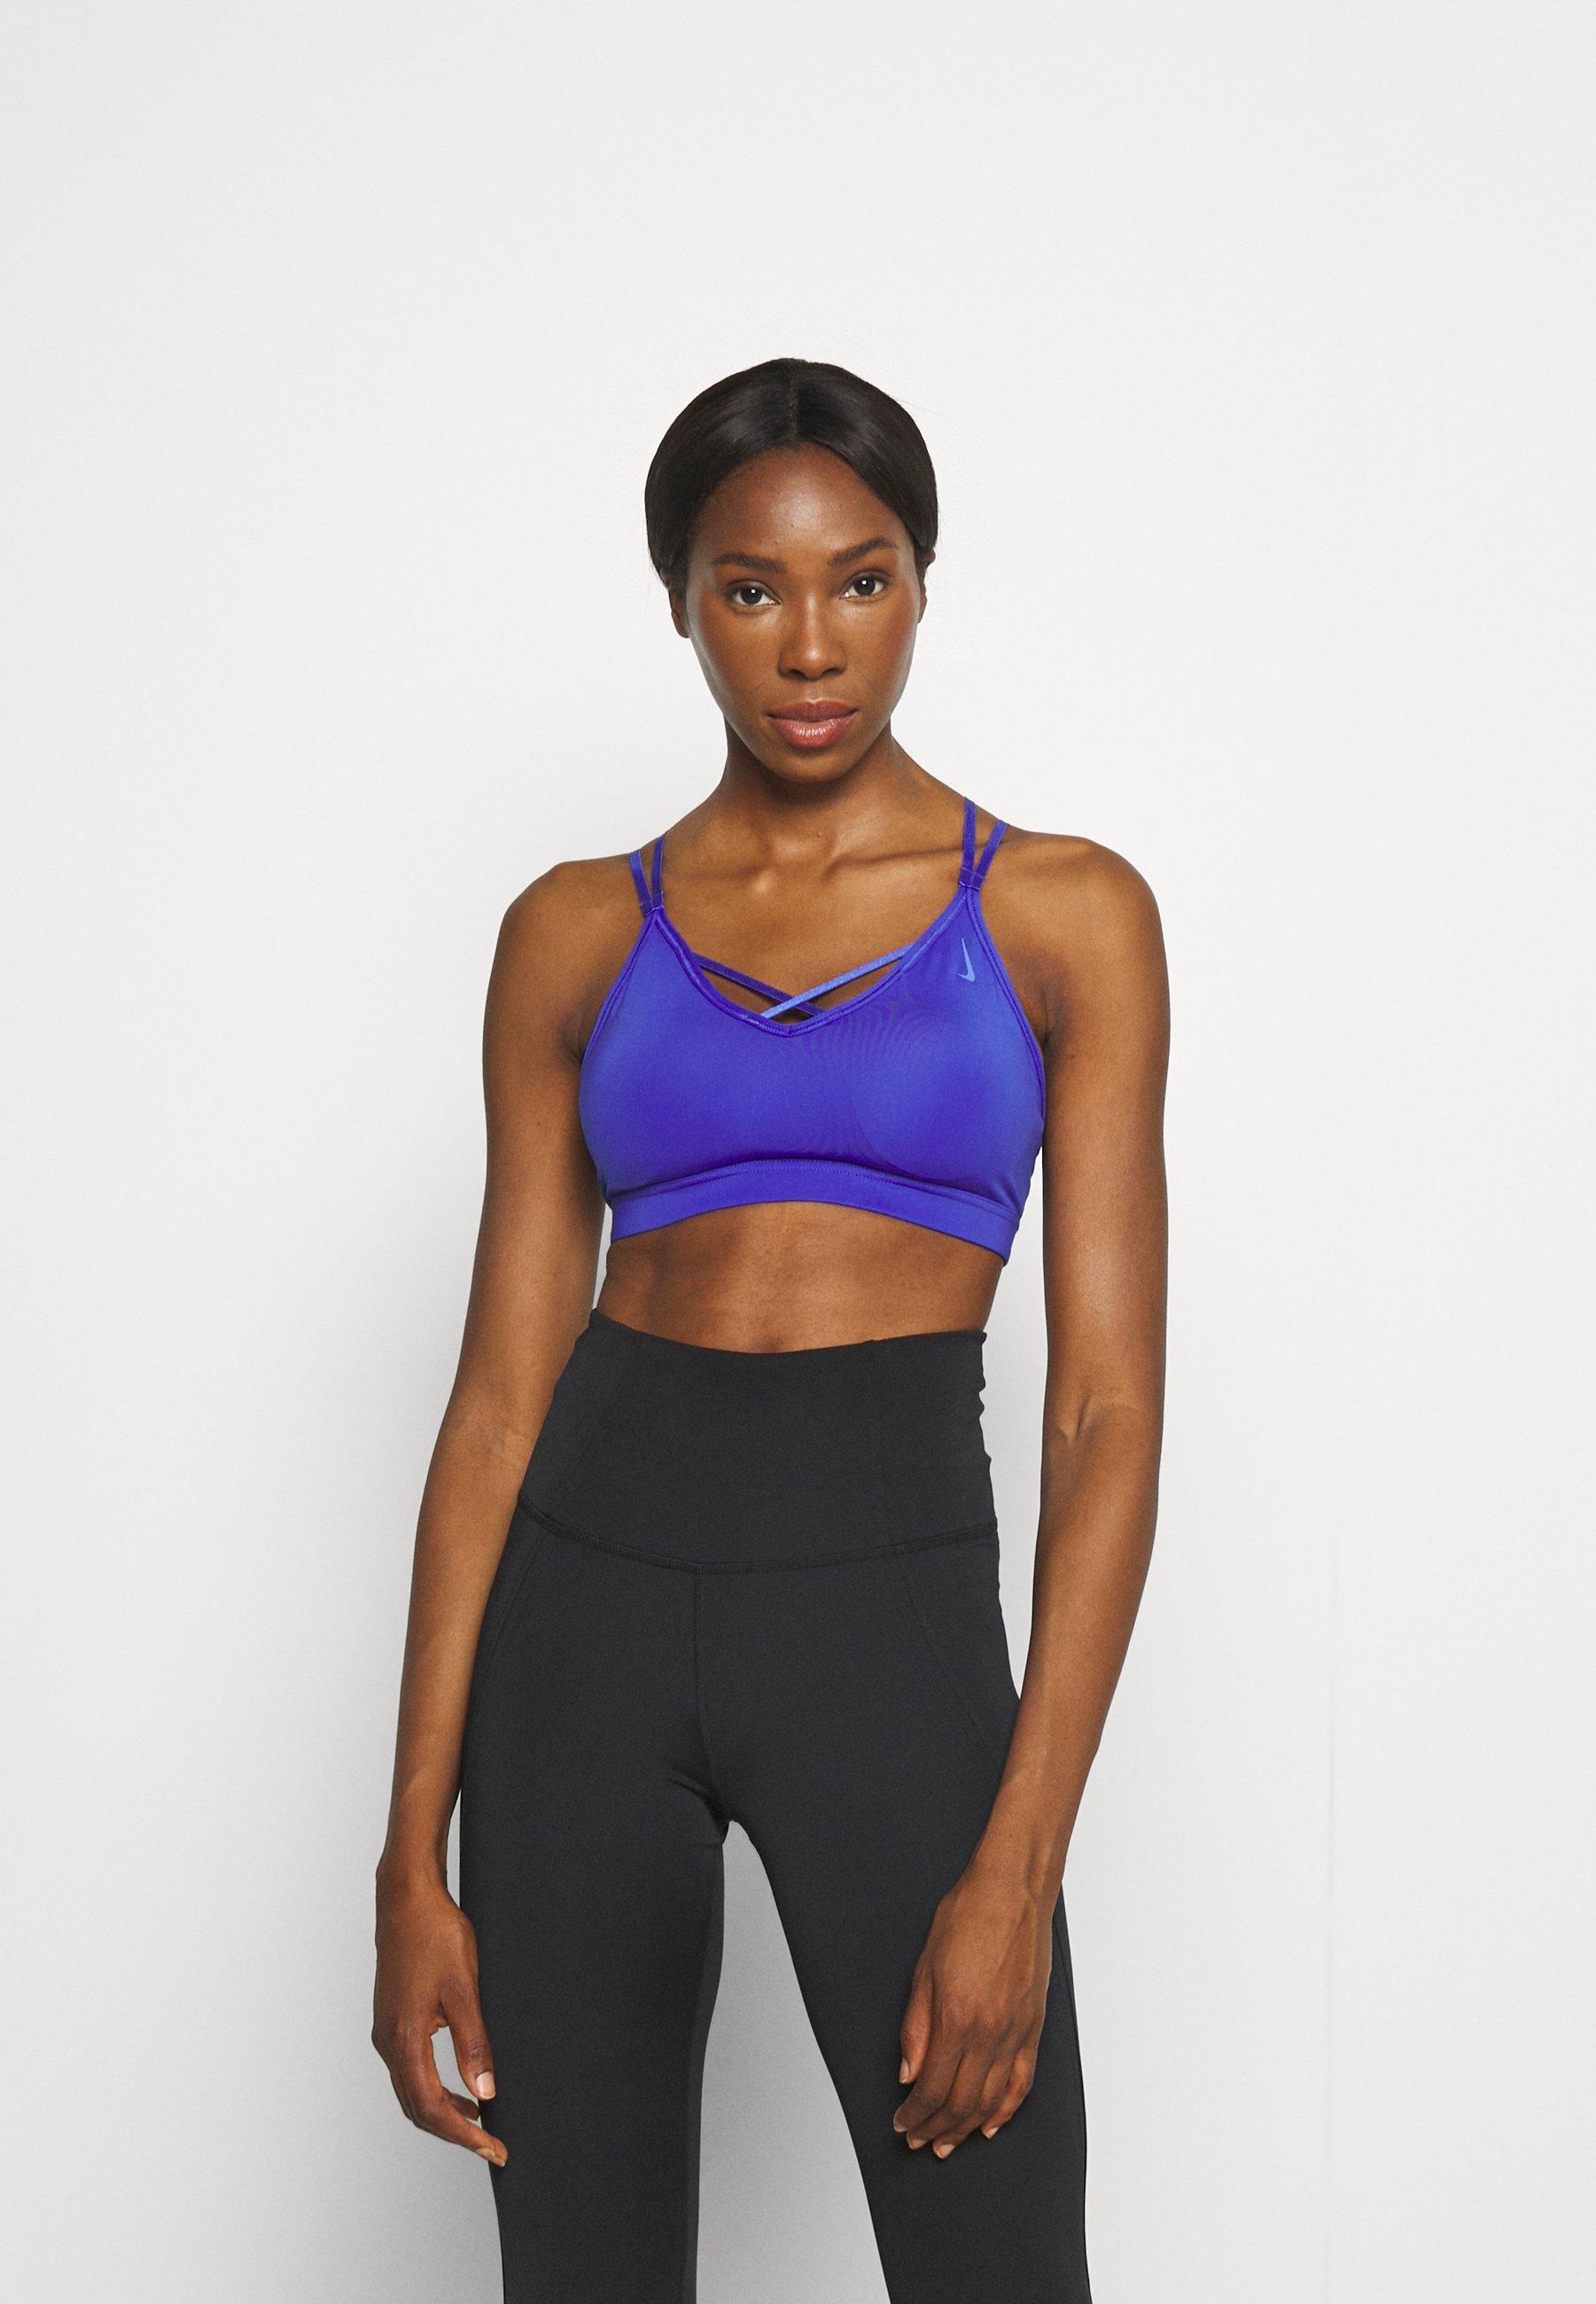 Women INDY STRAPPY BRA - Light support sports bra